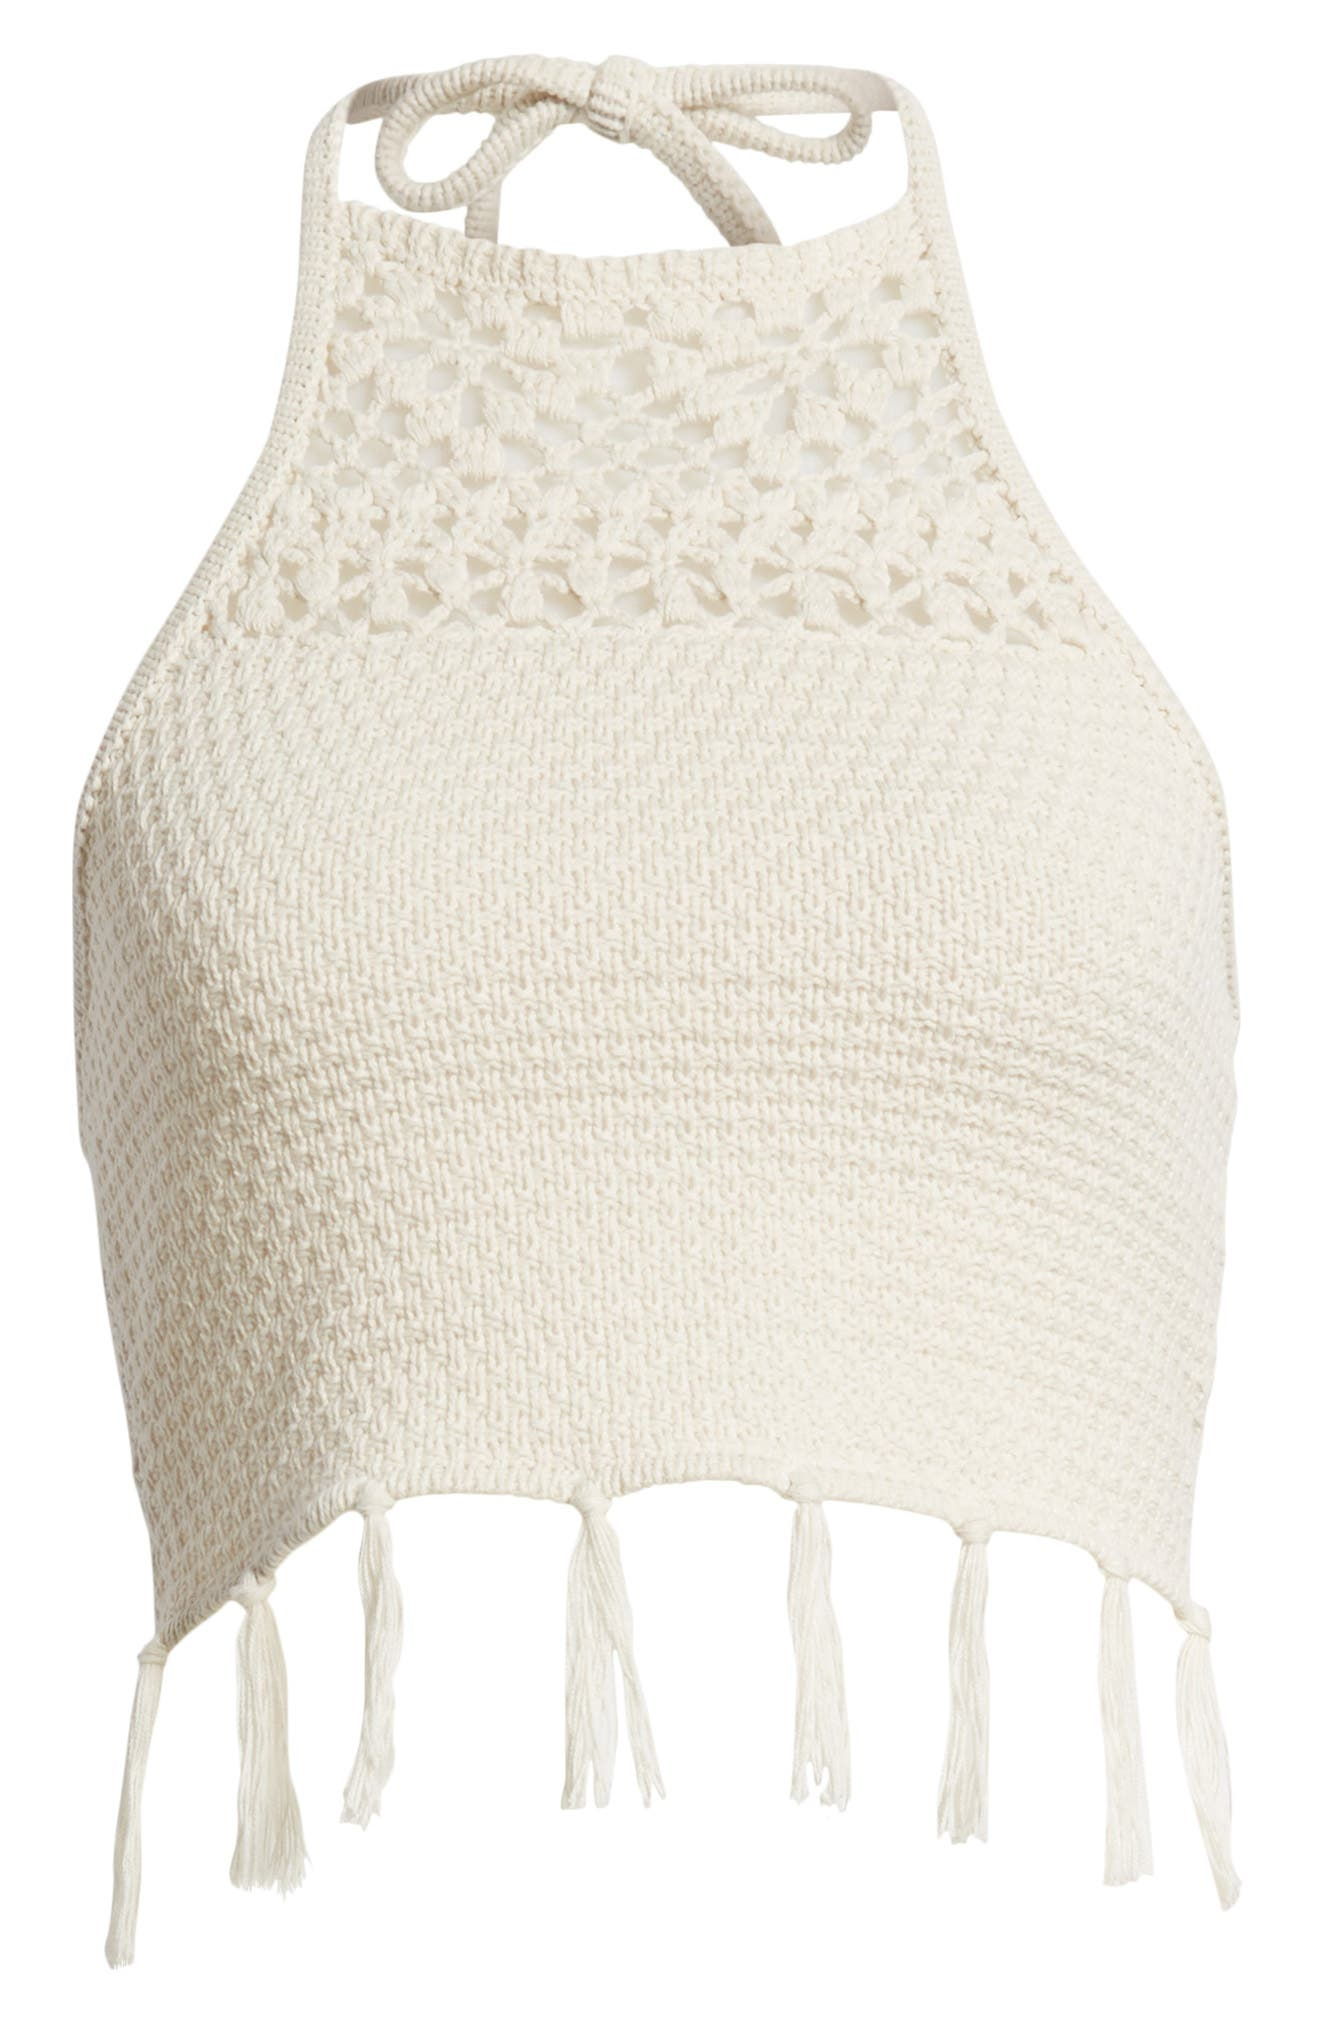 Fringe Sweater Halter Top,                             Alternate thumbnail 7, color,                             Stone Oatmeal Marl